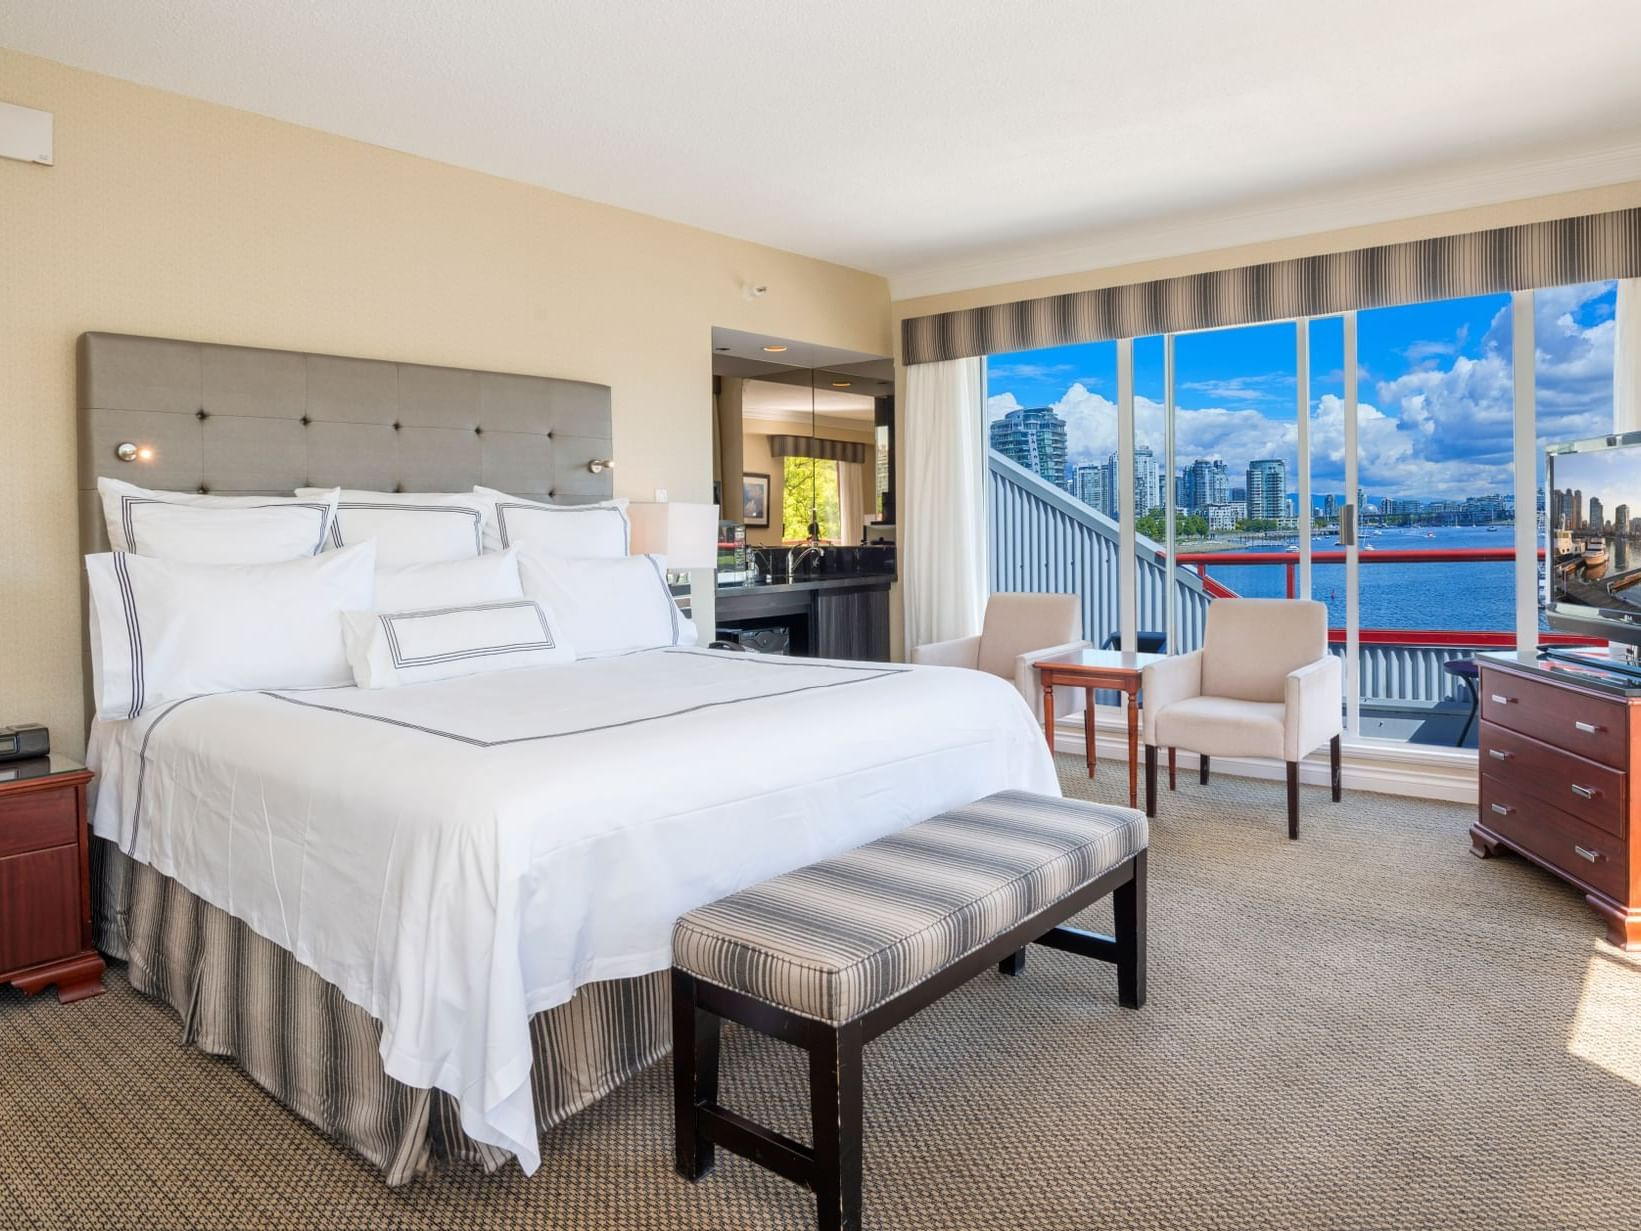 Boardwalk Suite bedroom with king bed at Granville Island Hotel